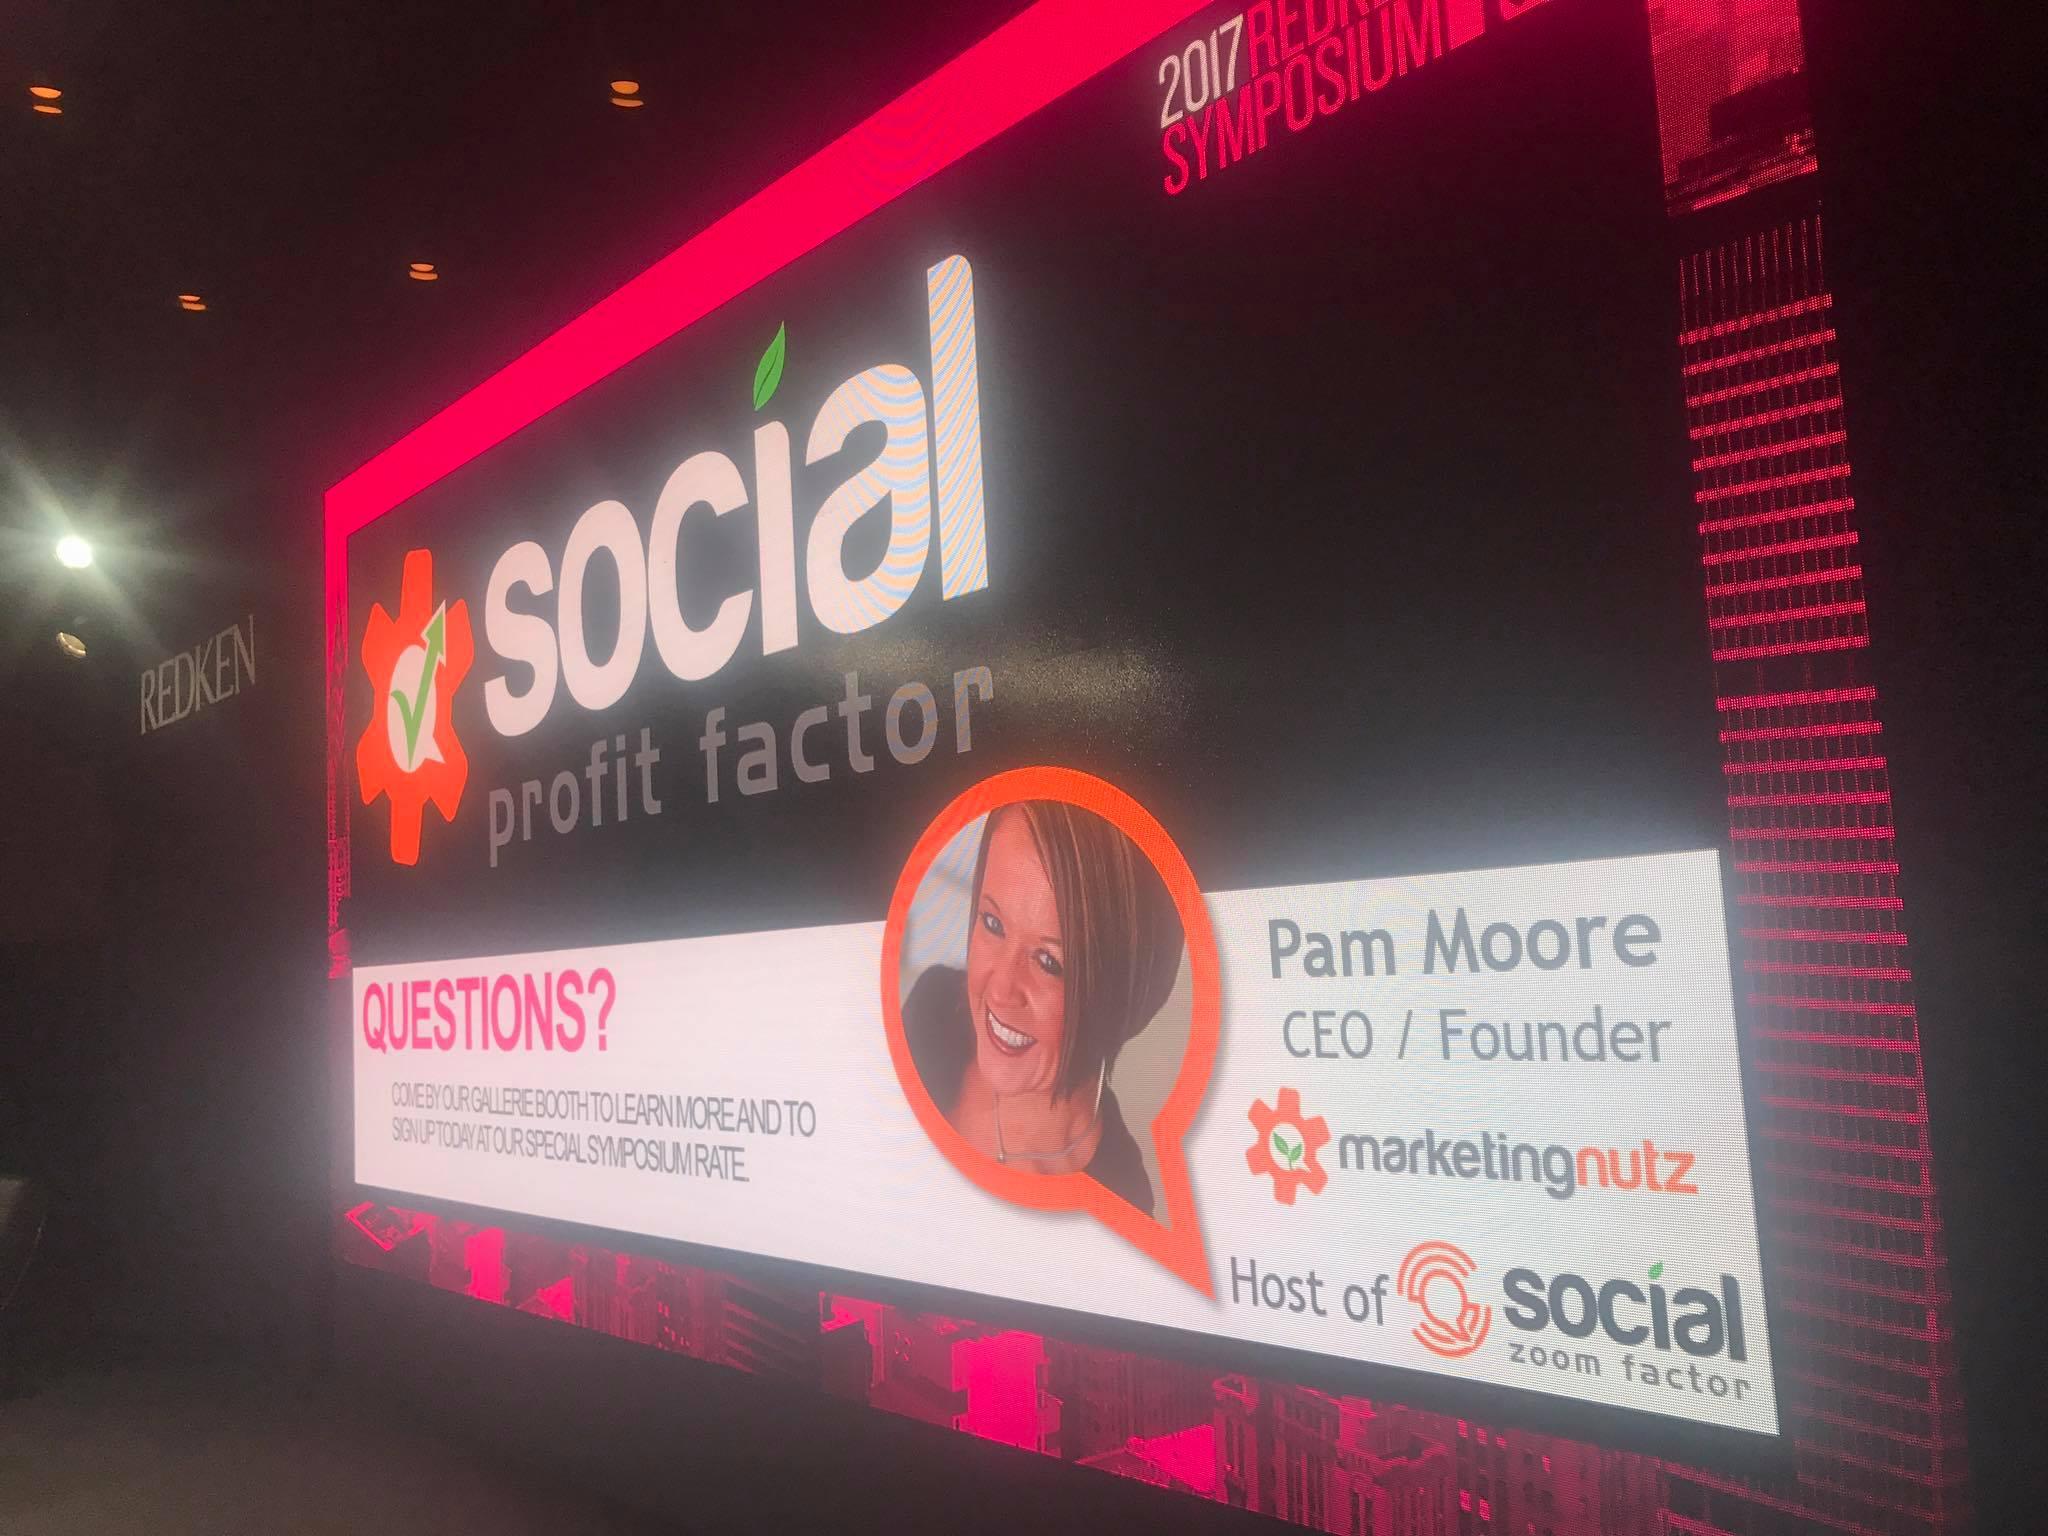 Marketing Nutz Social Profit Factor Redken Symposium